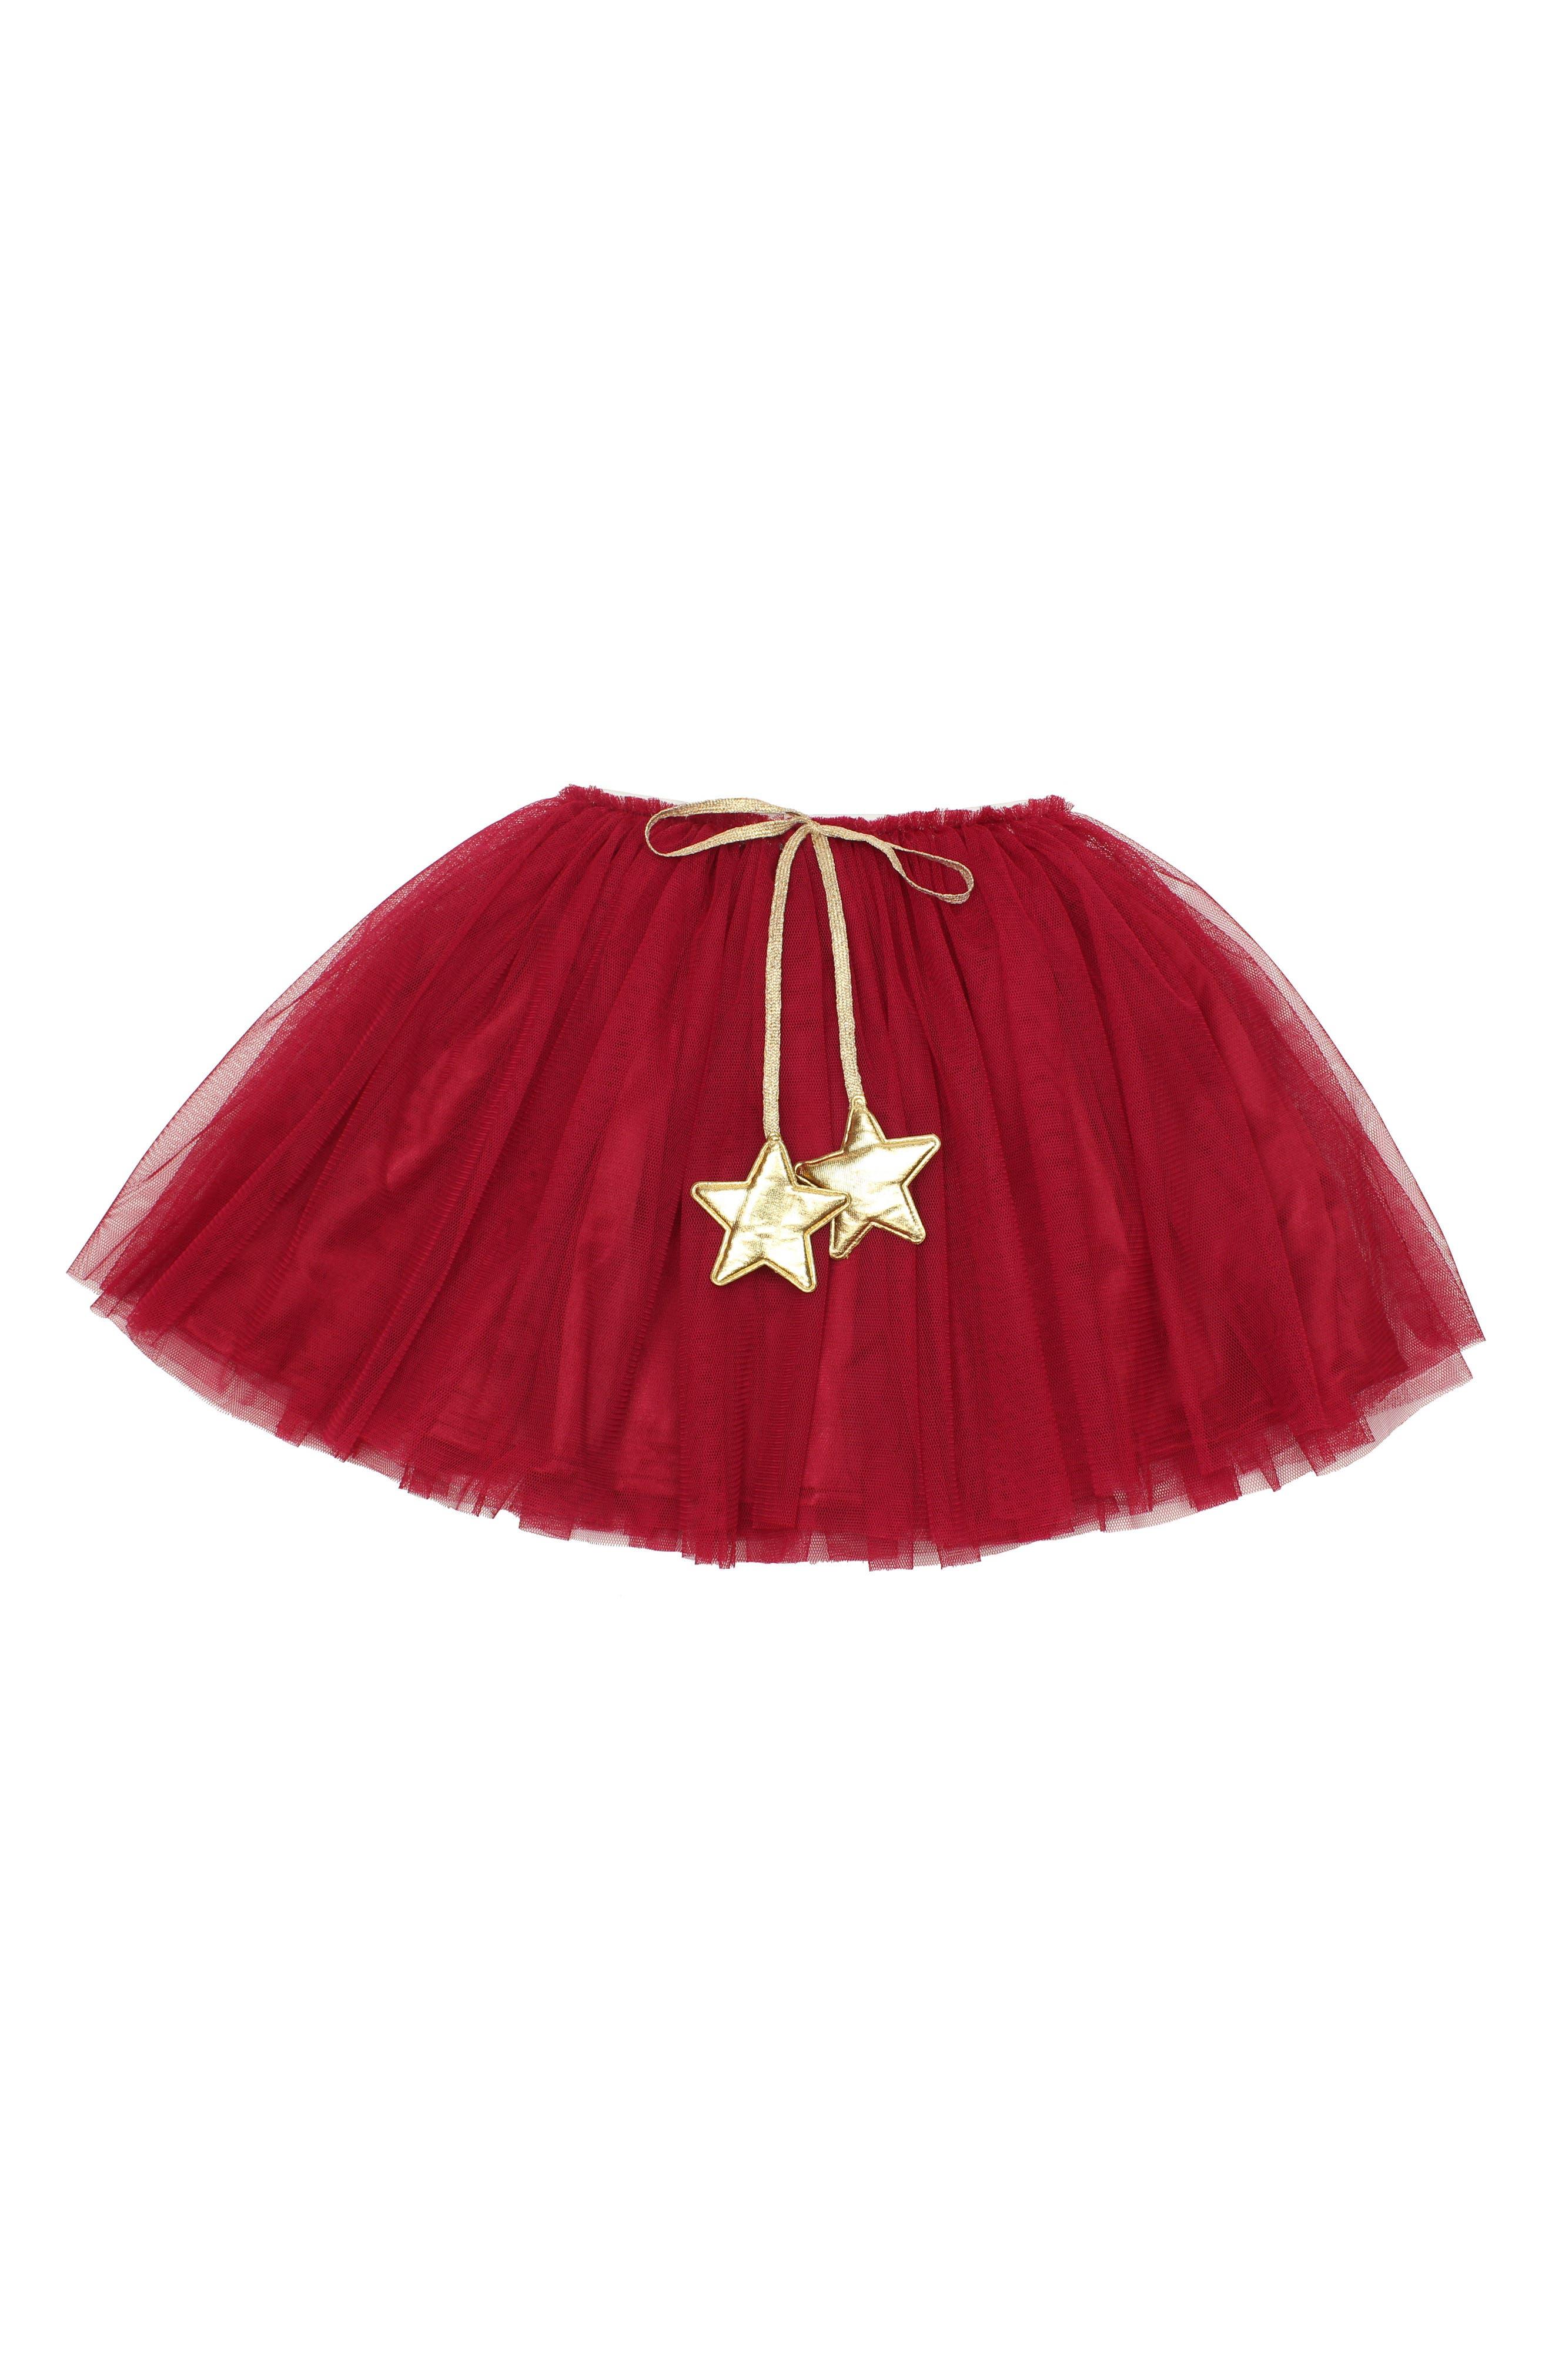 POPATU Gold Star Tutu Skirt, Main, color, BURGUNDY